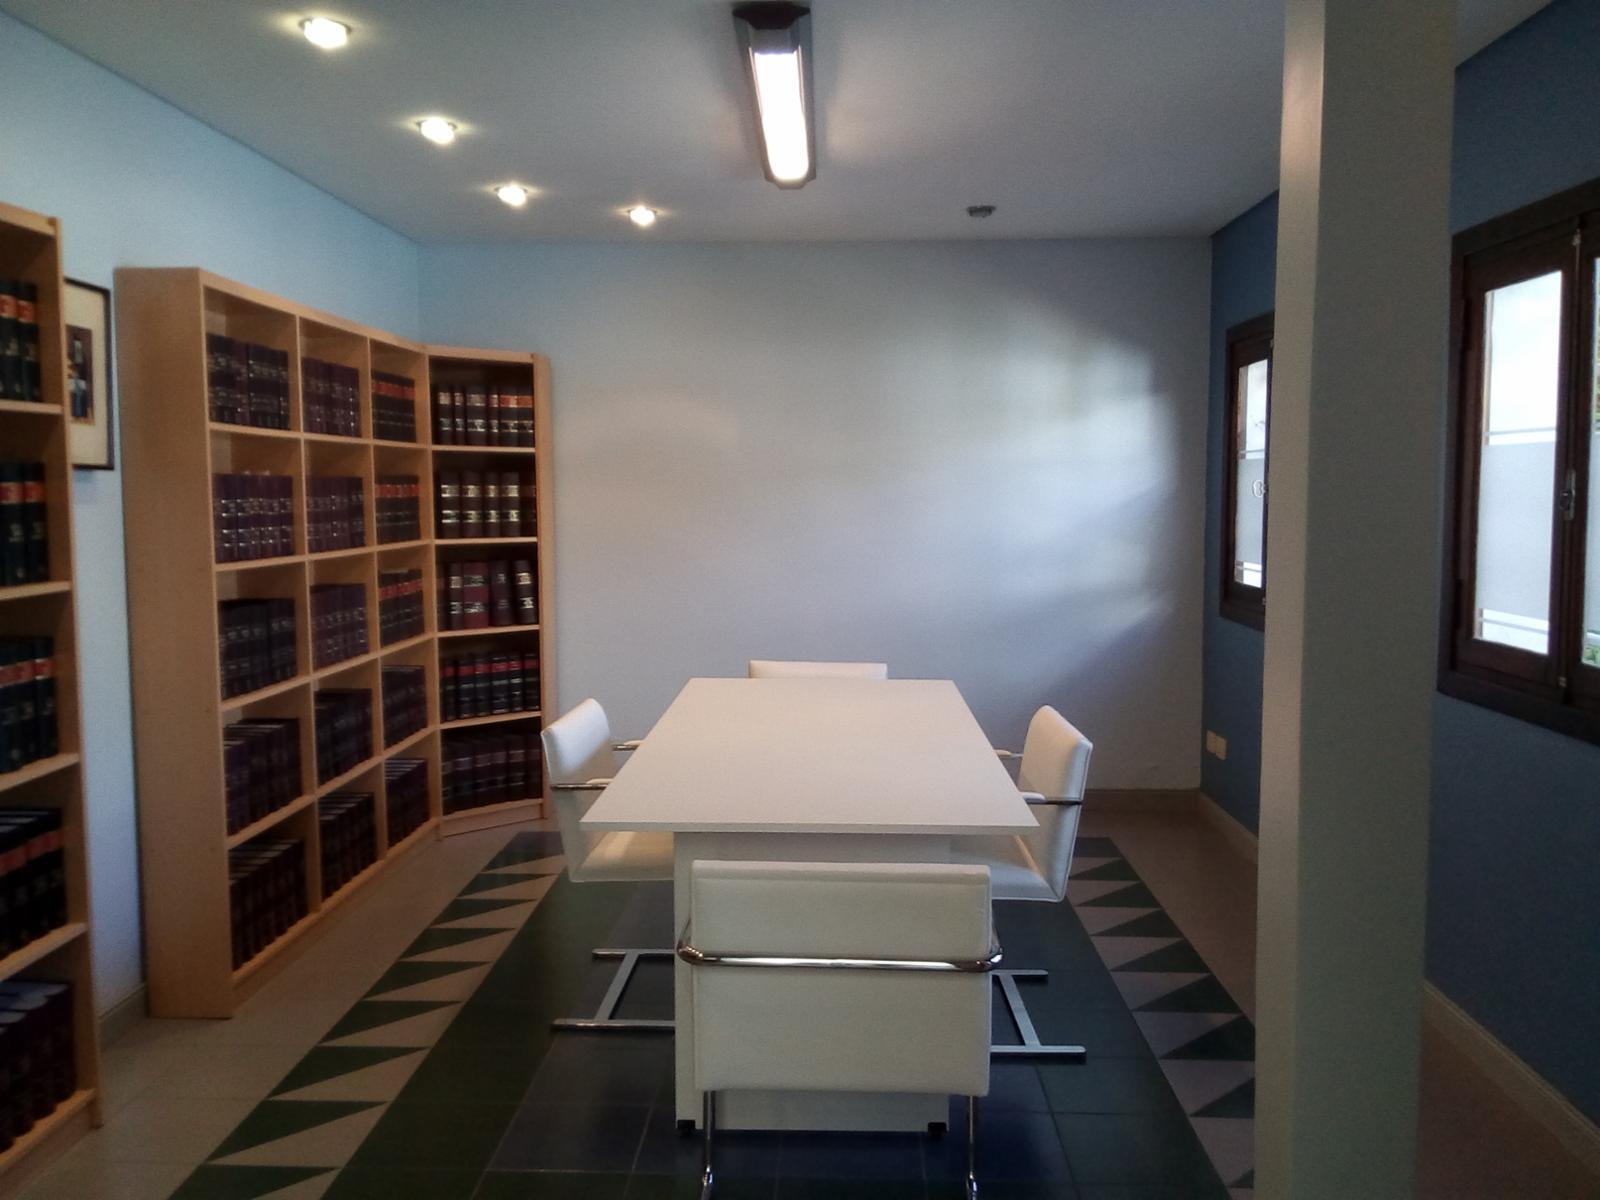 Oficinas EN ALQUILER totalmente equipadas. Uso profesional. Excelente ubicación., ADBARNI Servicios Inmobiliarios